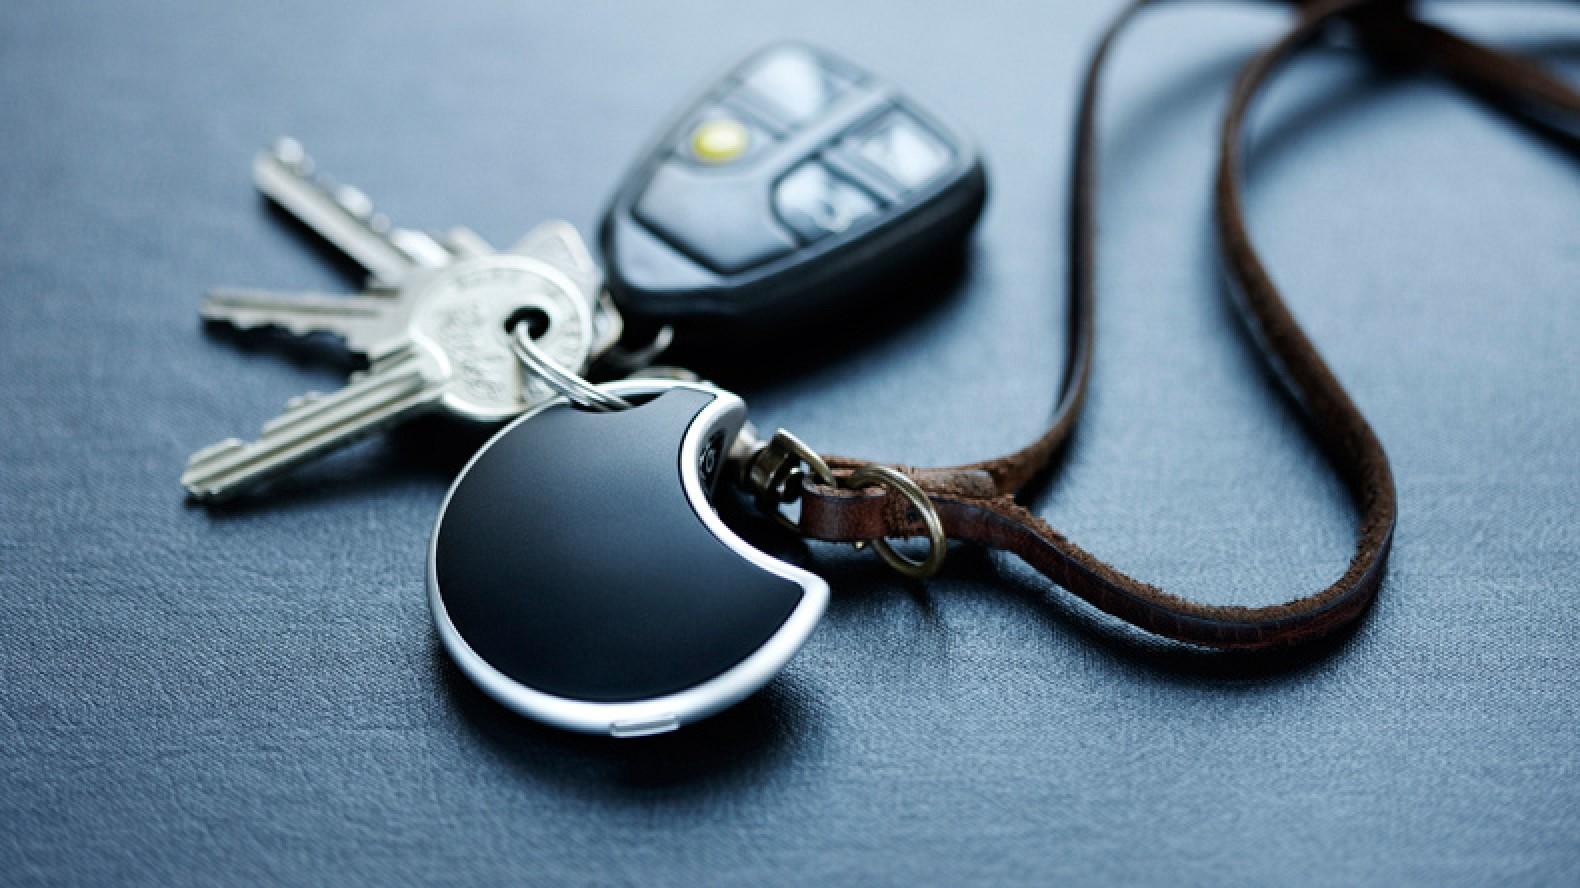 Lost Car Keys >> hipKey Proximity Sensor for iOS Devices Now Available ...